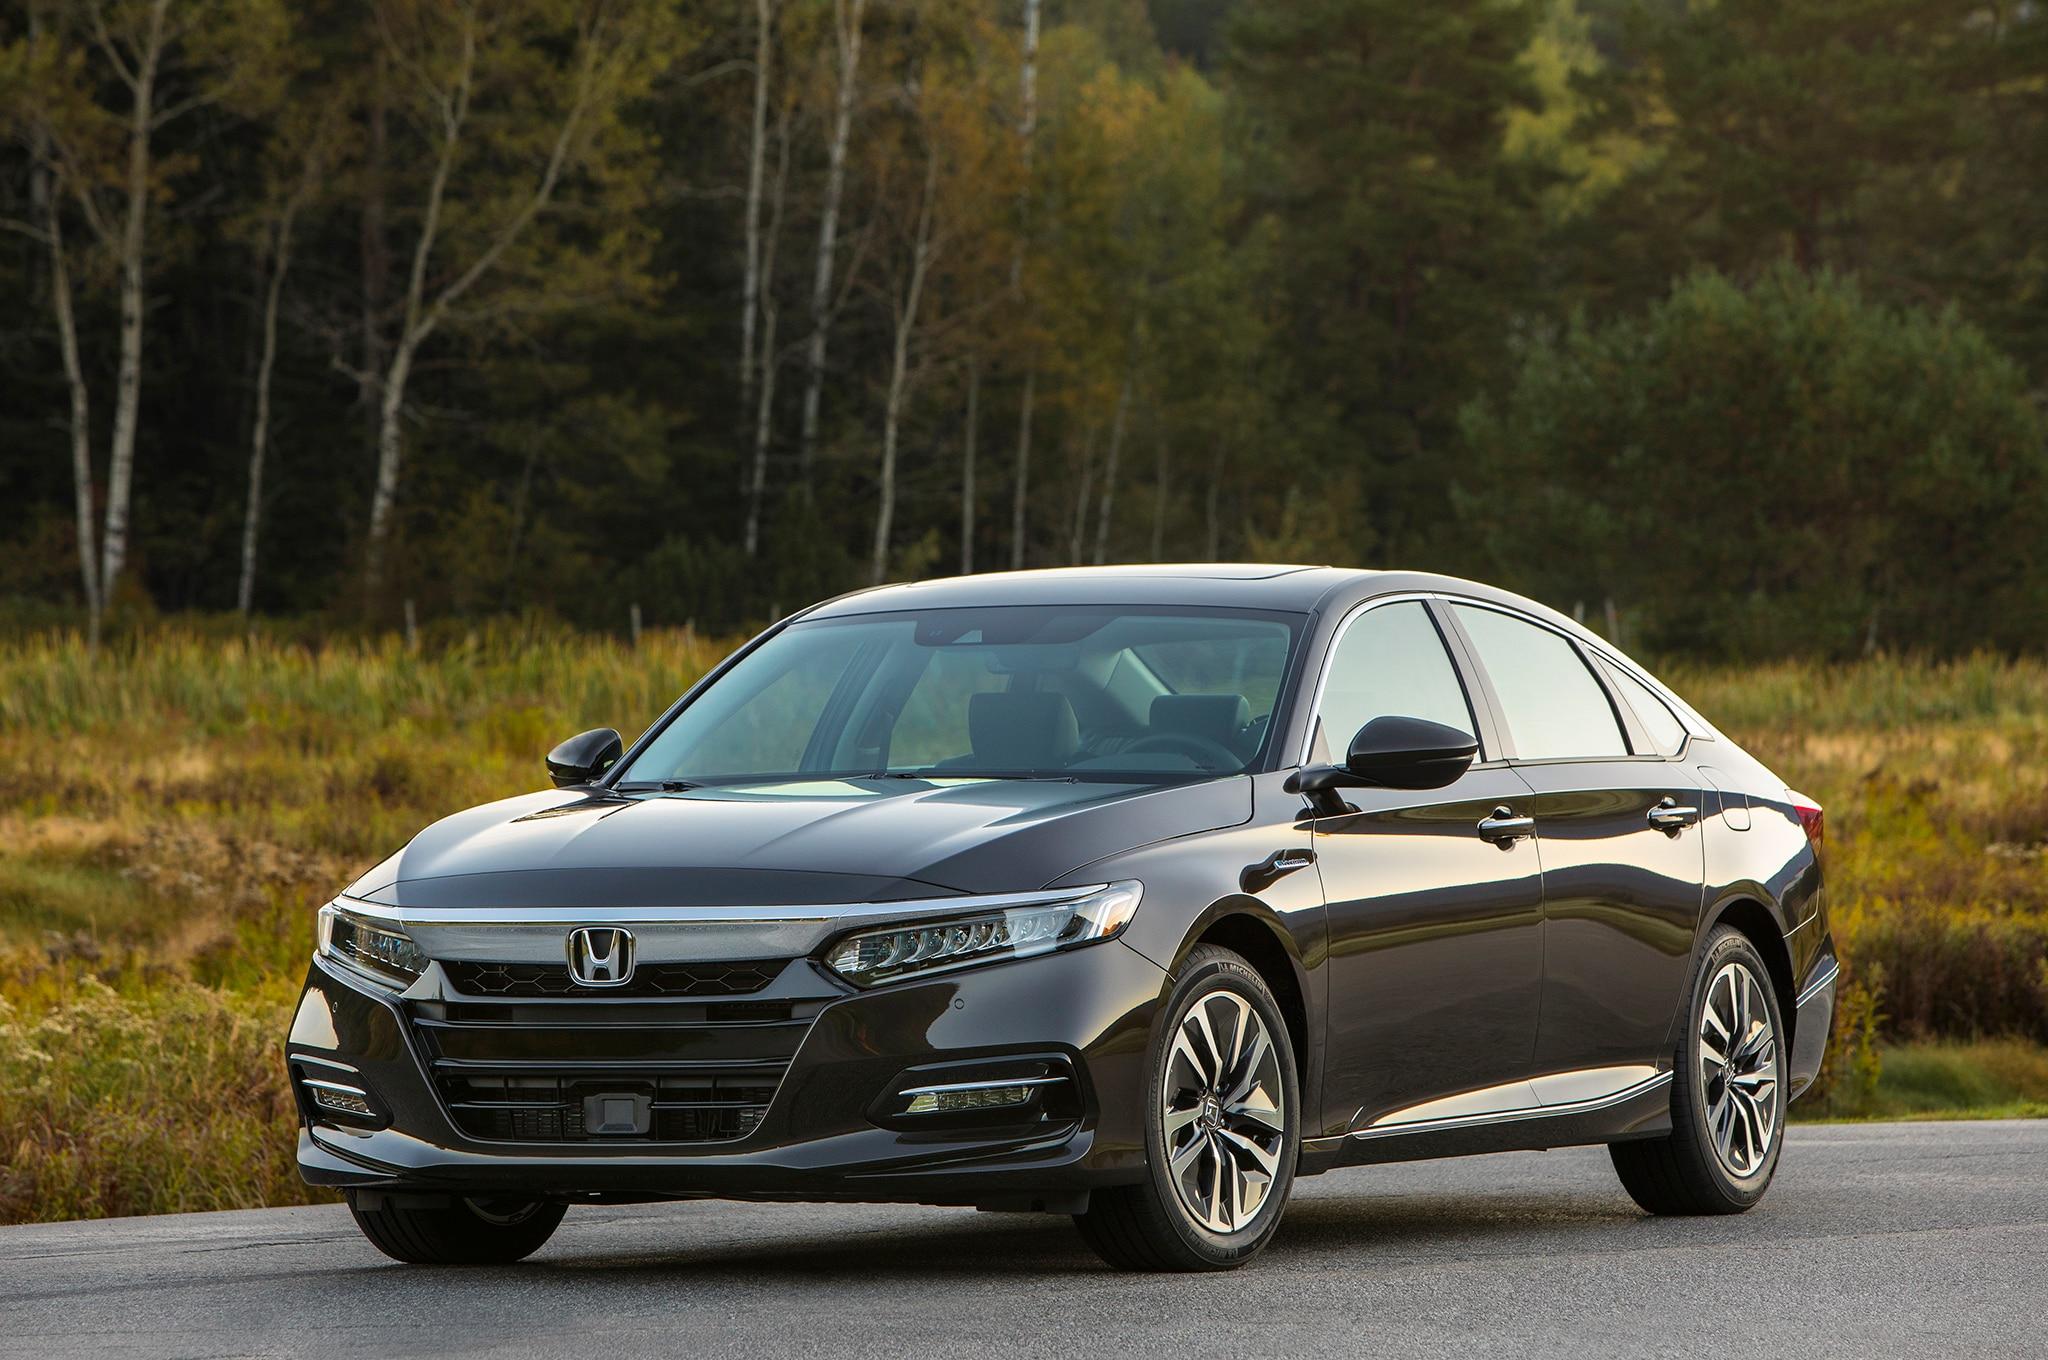 2018 honda accord hybrid base price slashed to 25 990 automobile magazine. Black Bedroom Furniture Sets. Home Design Ideas